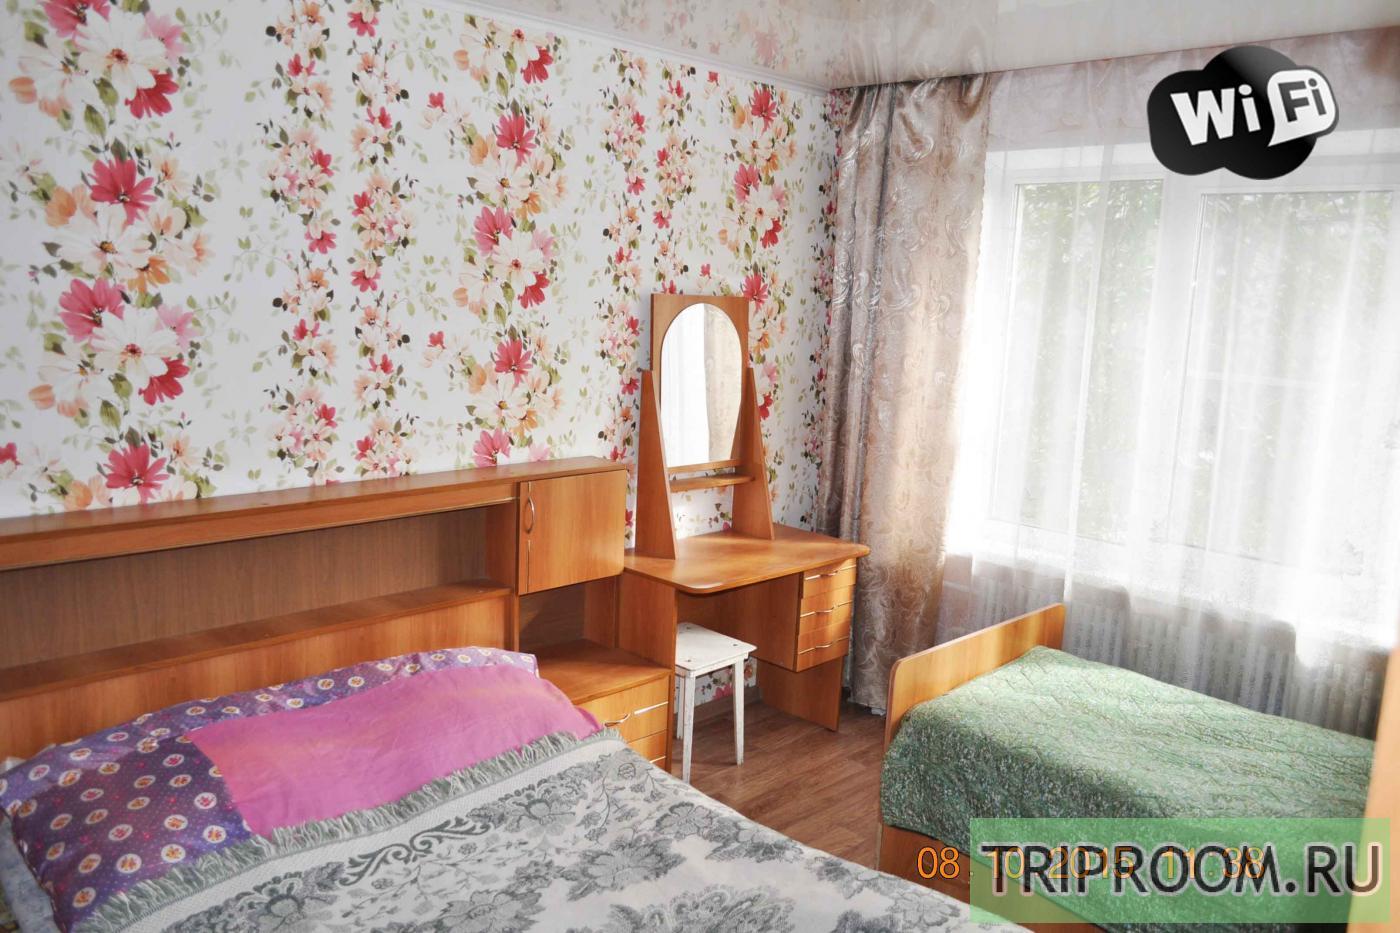 2-комнатная квартира посуточно (вариант № 11708), ул. Амосова улица, фото № 13